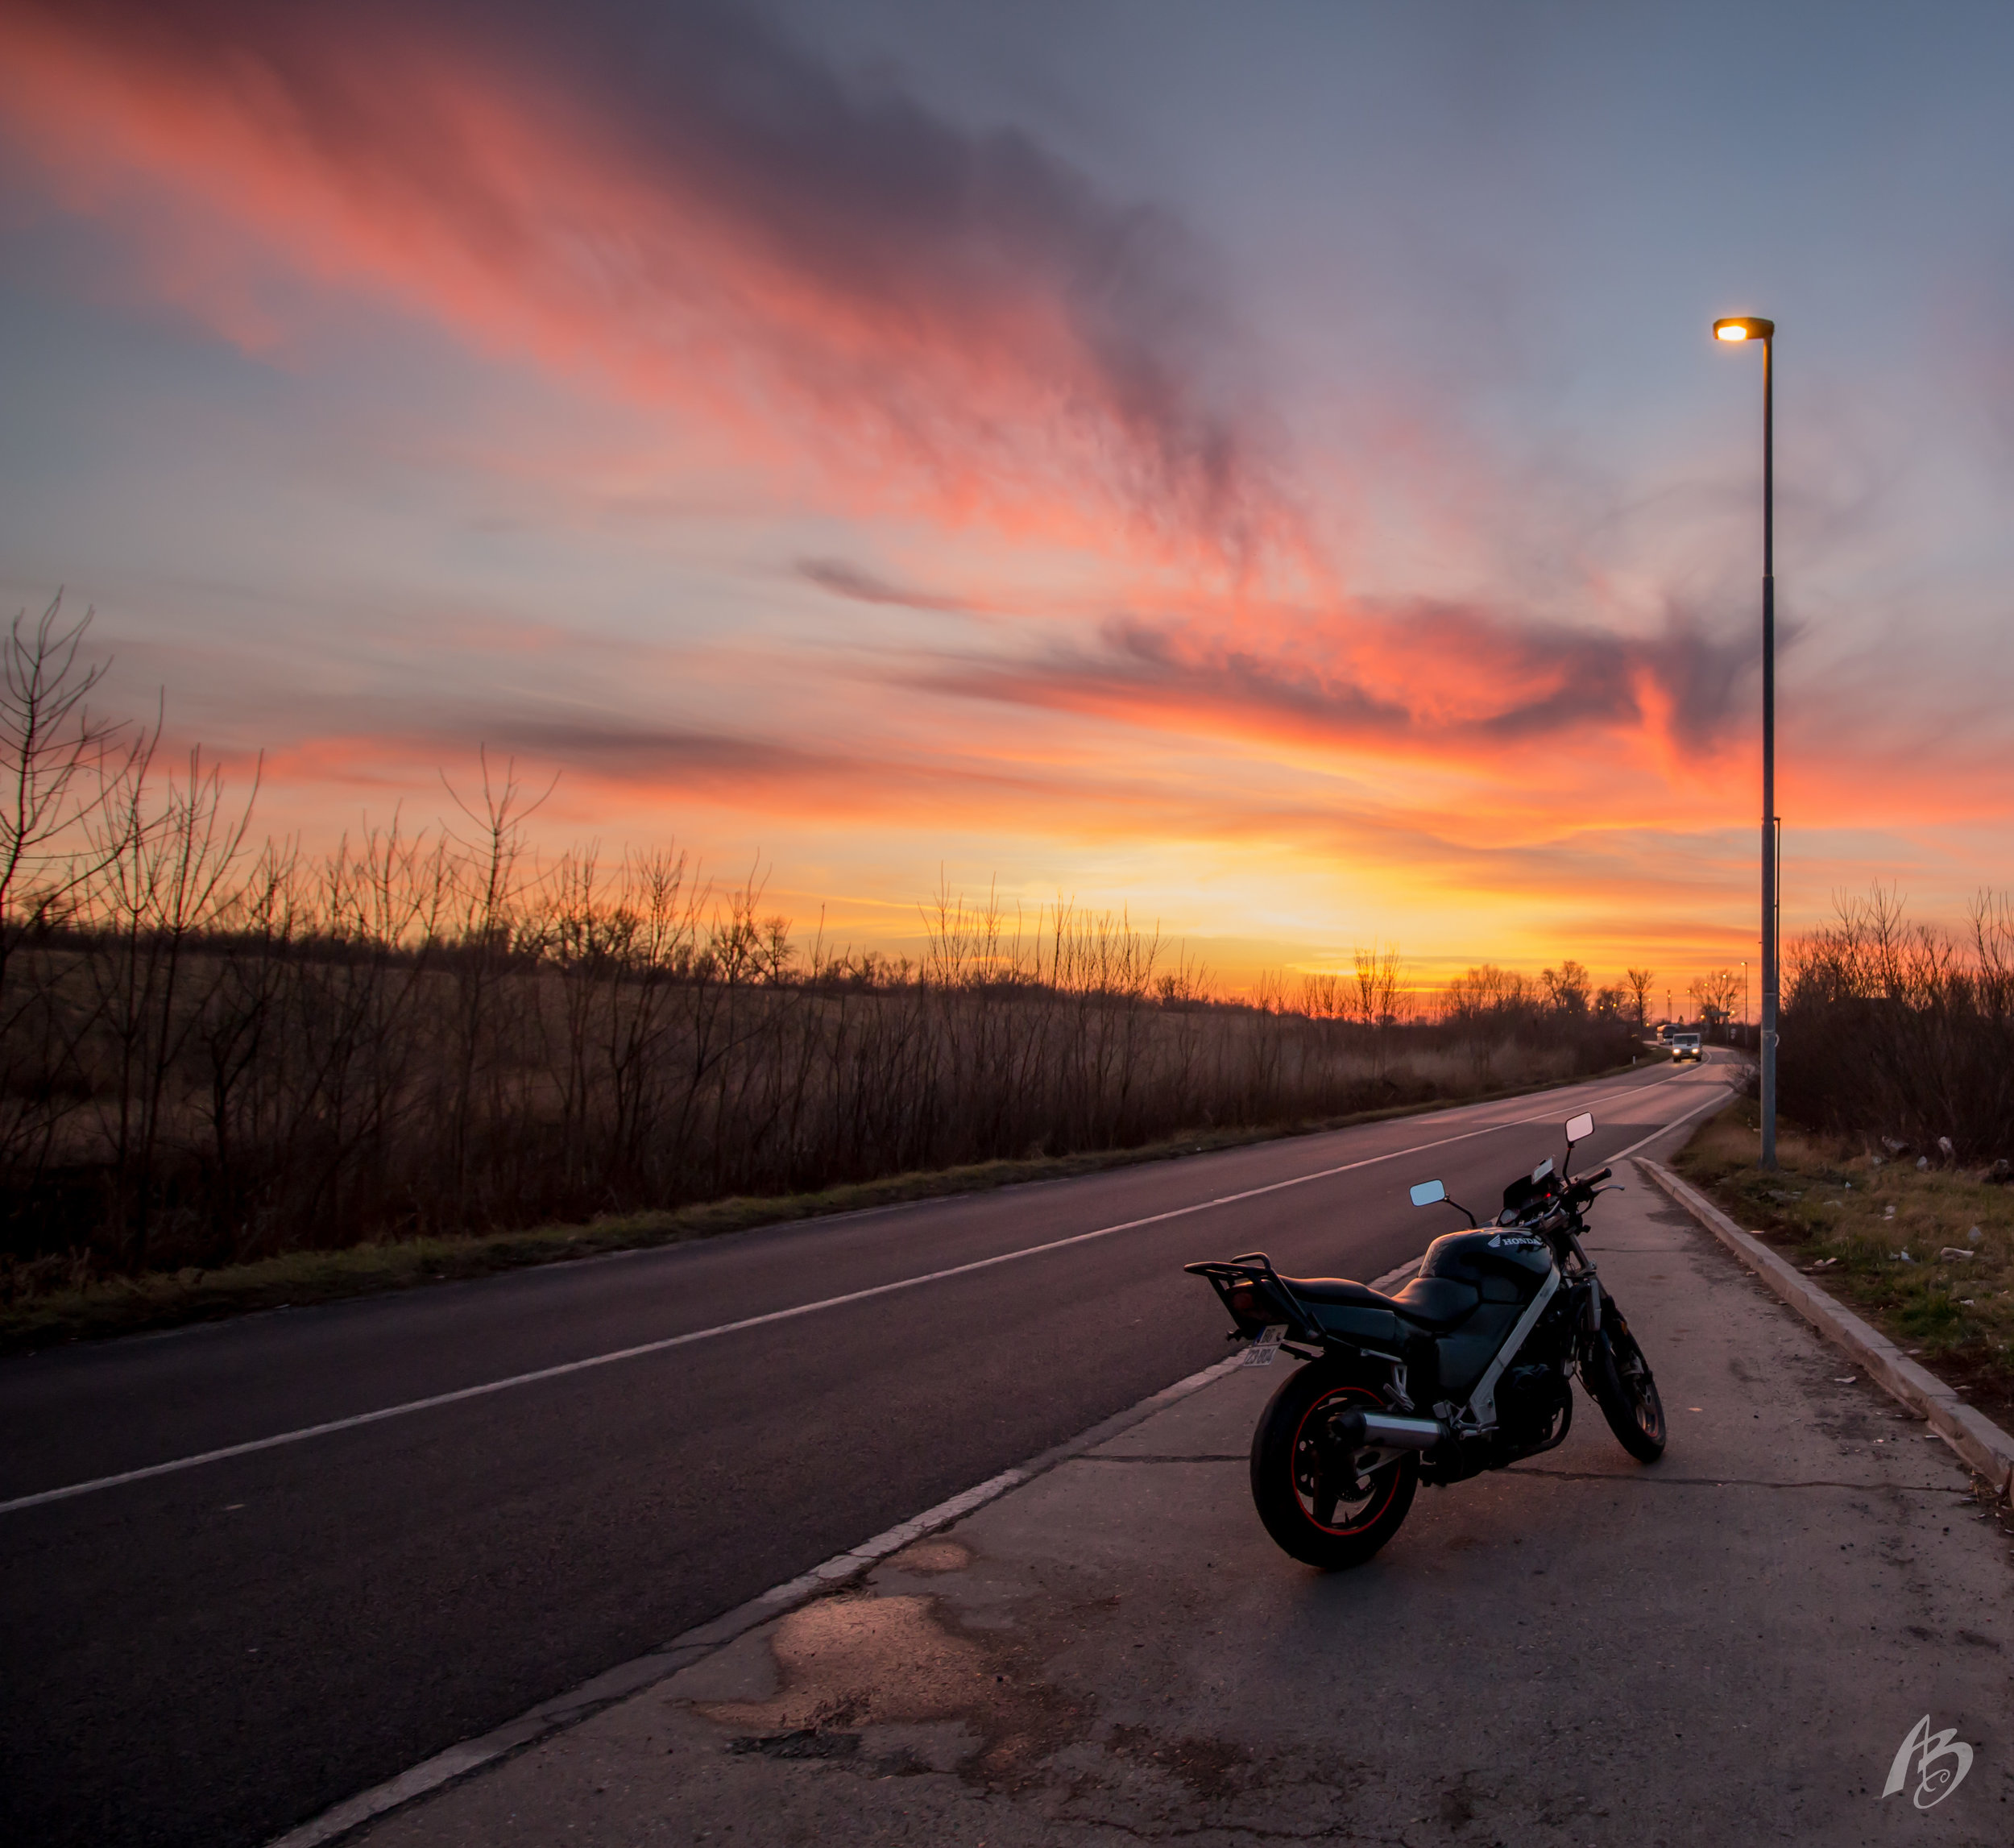 Pančevo, Serbia at sunset.